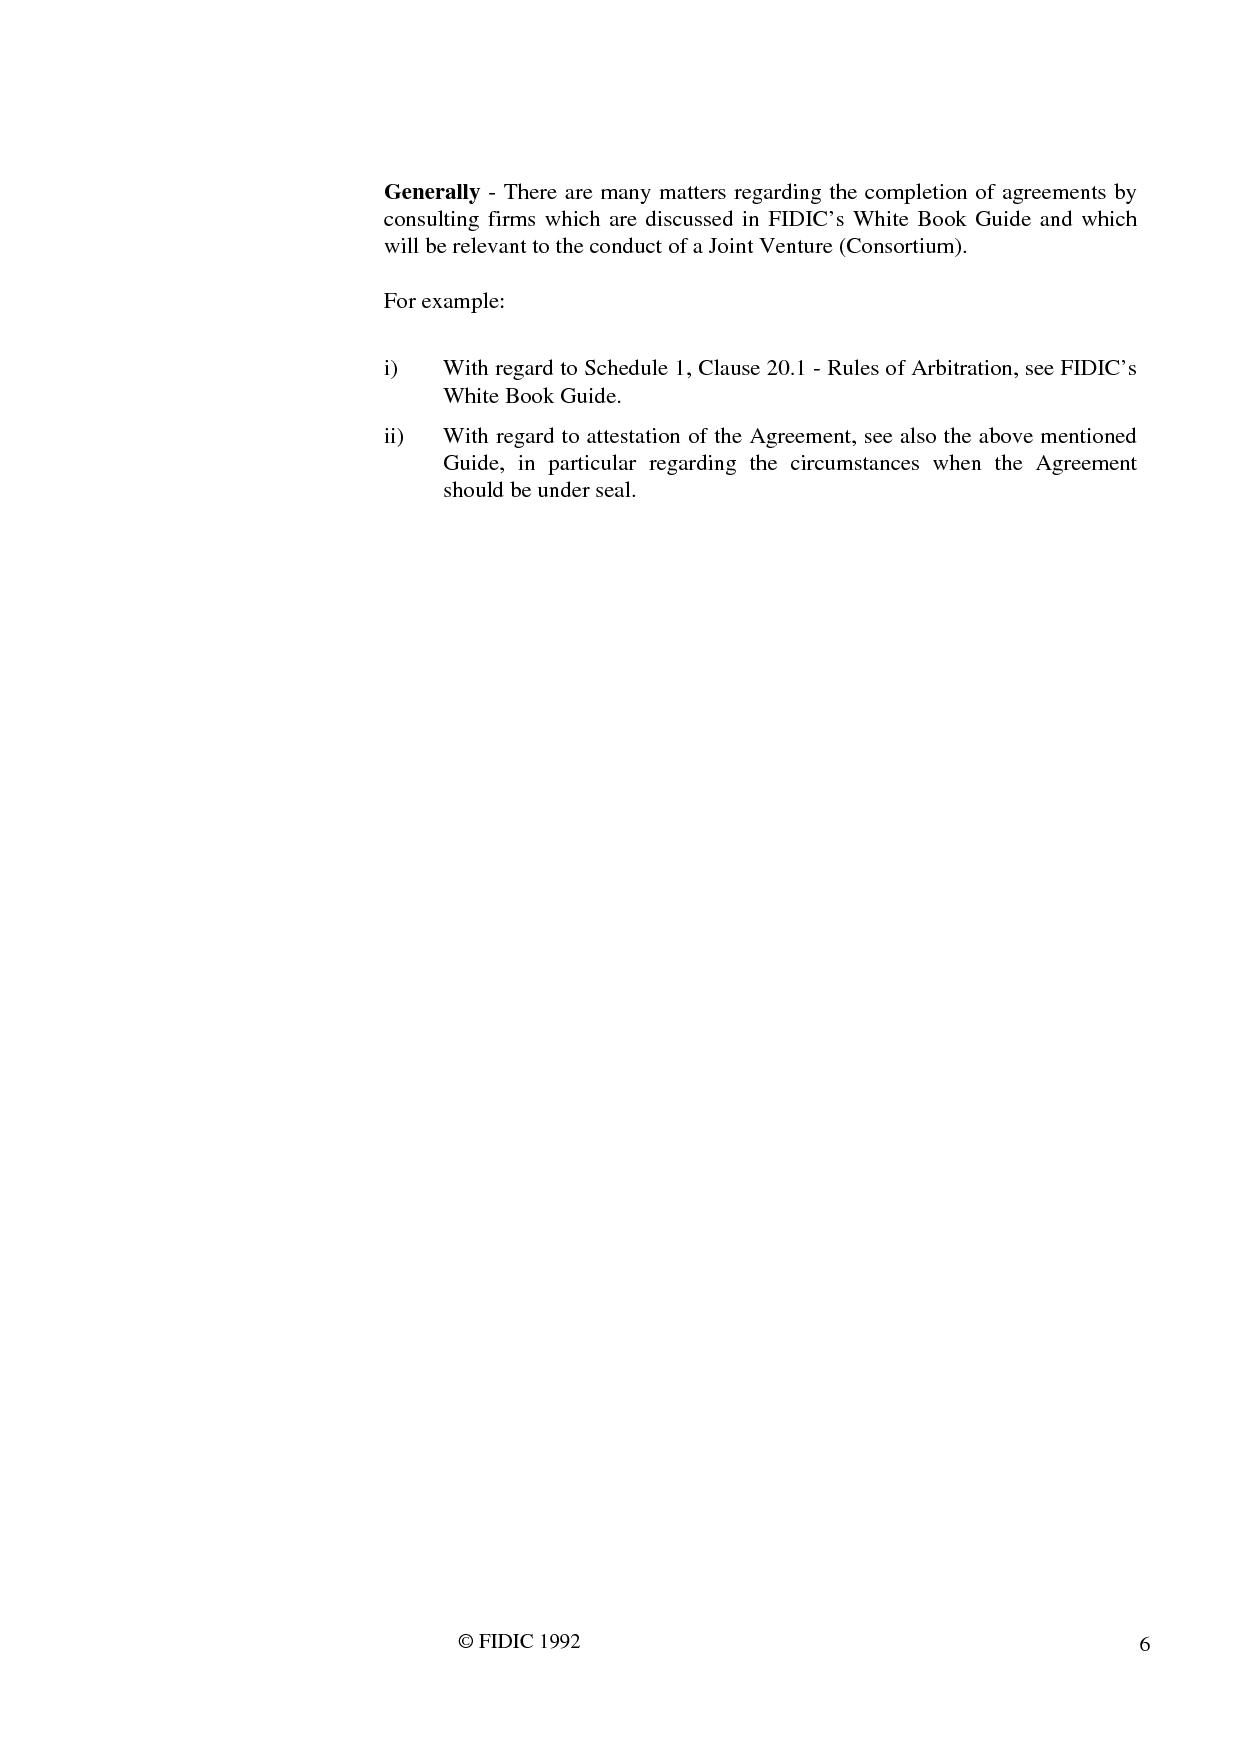 Joint venture agreement 1st ed 1992 international federation joint venture agreement 1st ed 1992 platinumwayz